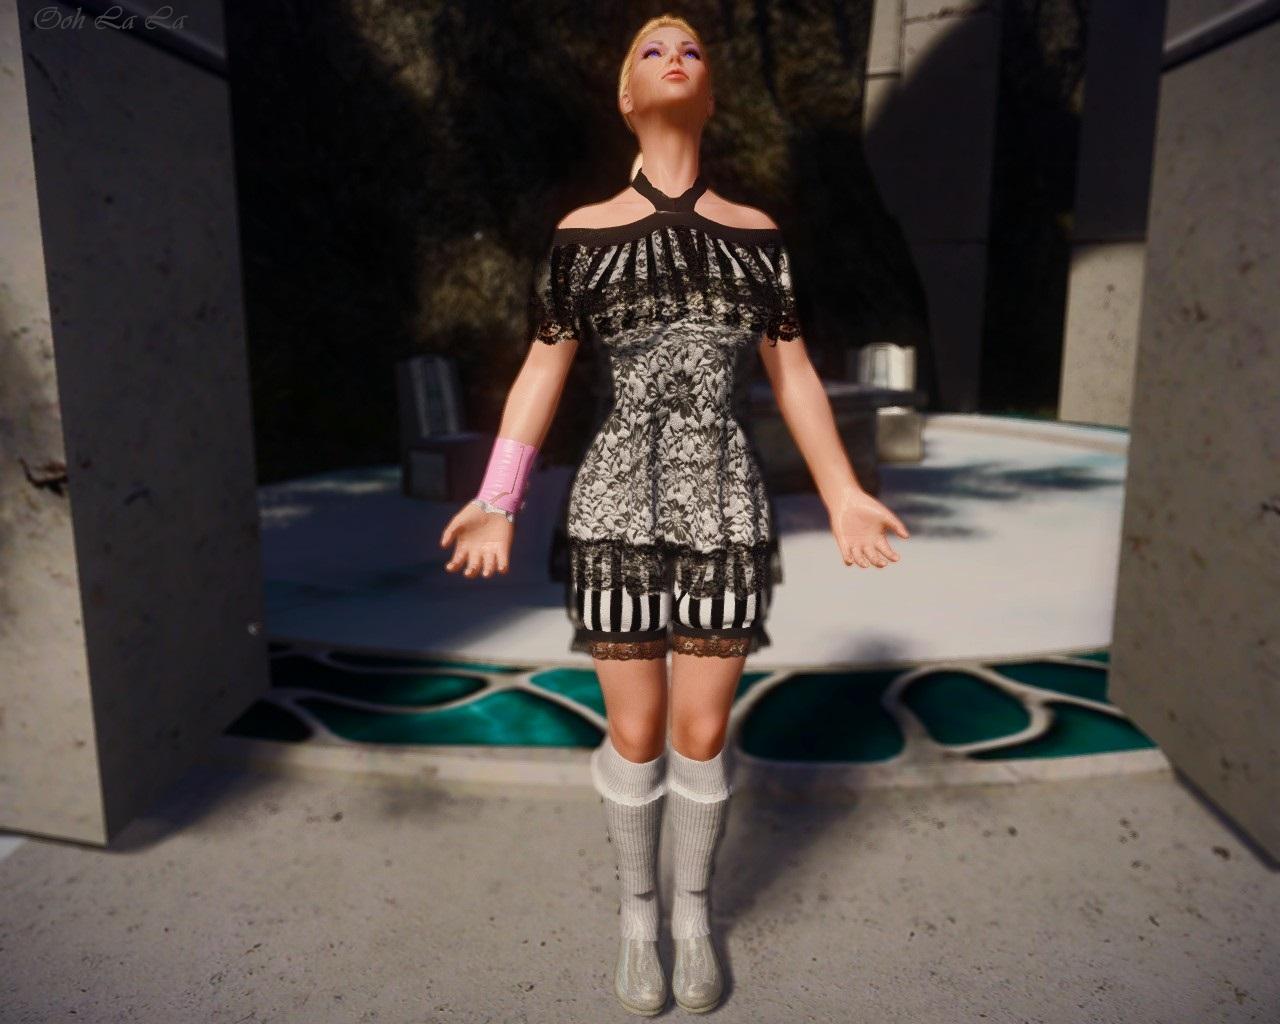 [Melodic] Ooh La La Outfit 00.jpg